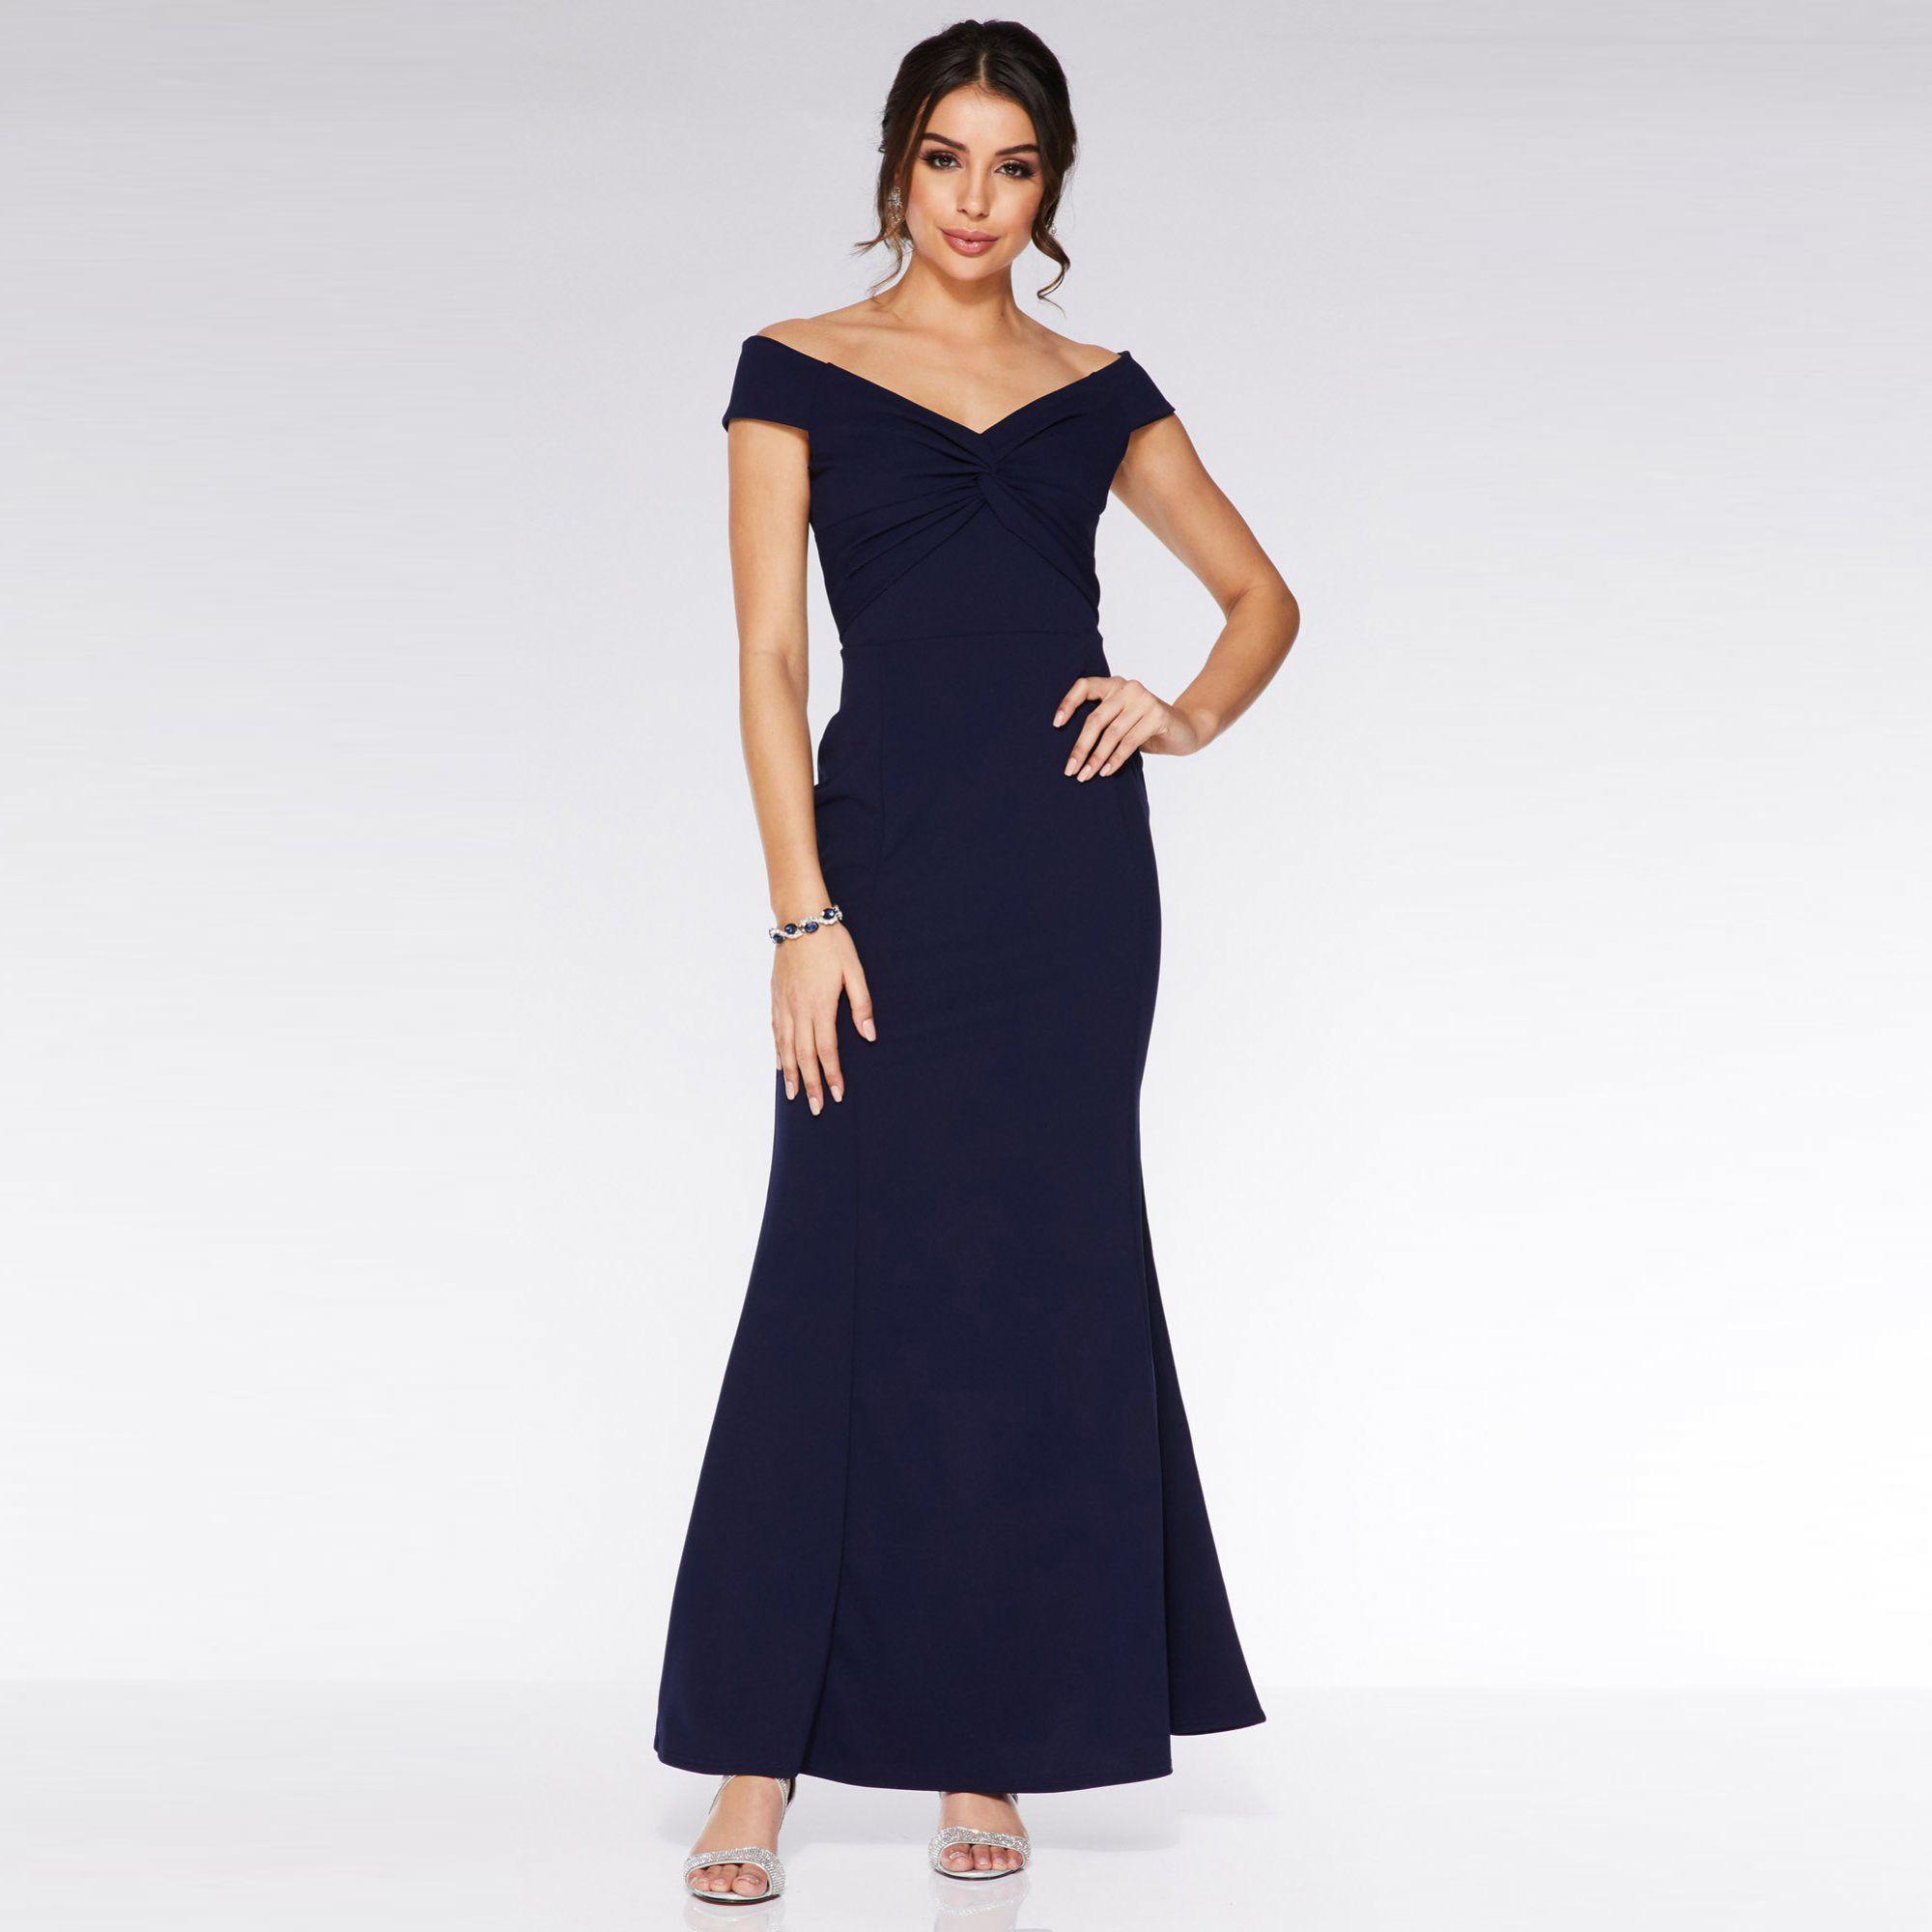 74e146a1efe Quiz Navy Bardot Knot Front Maxi Dress in Blue - Lyst